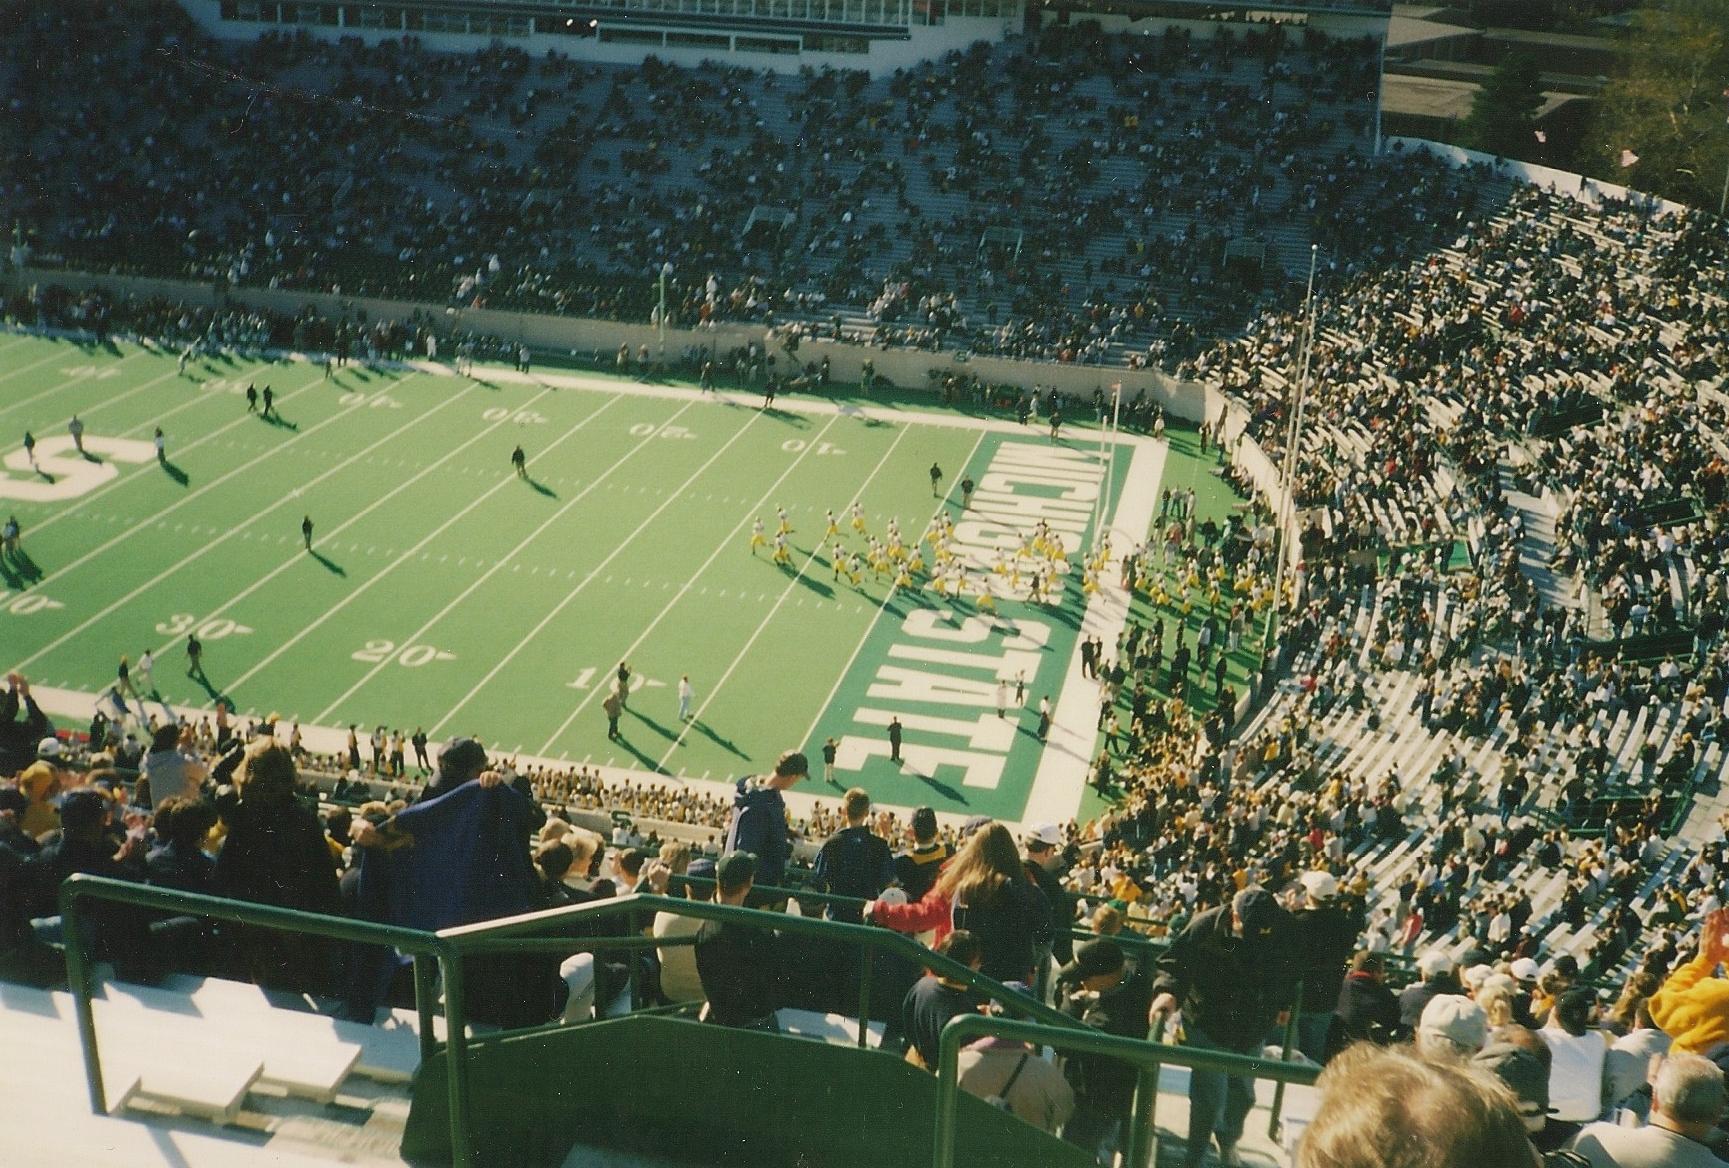 Michigan Vs Michigan State Football History image photo 1729x1168